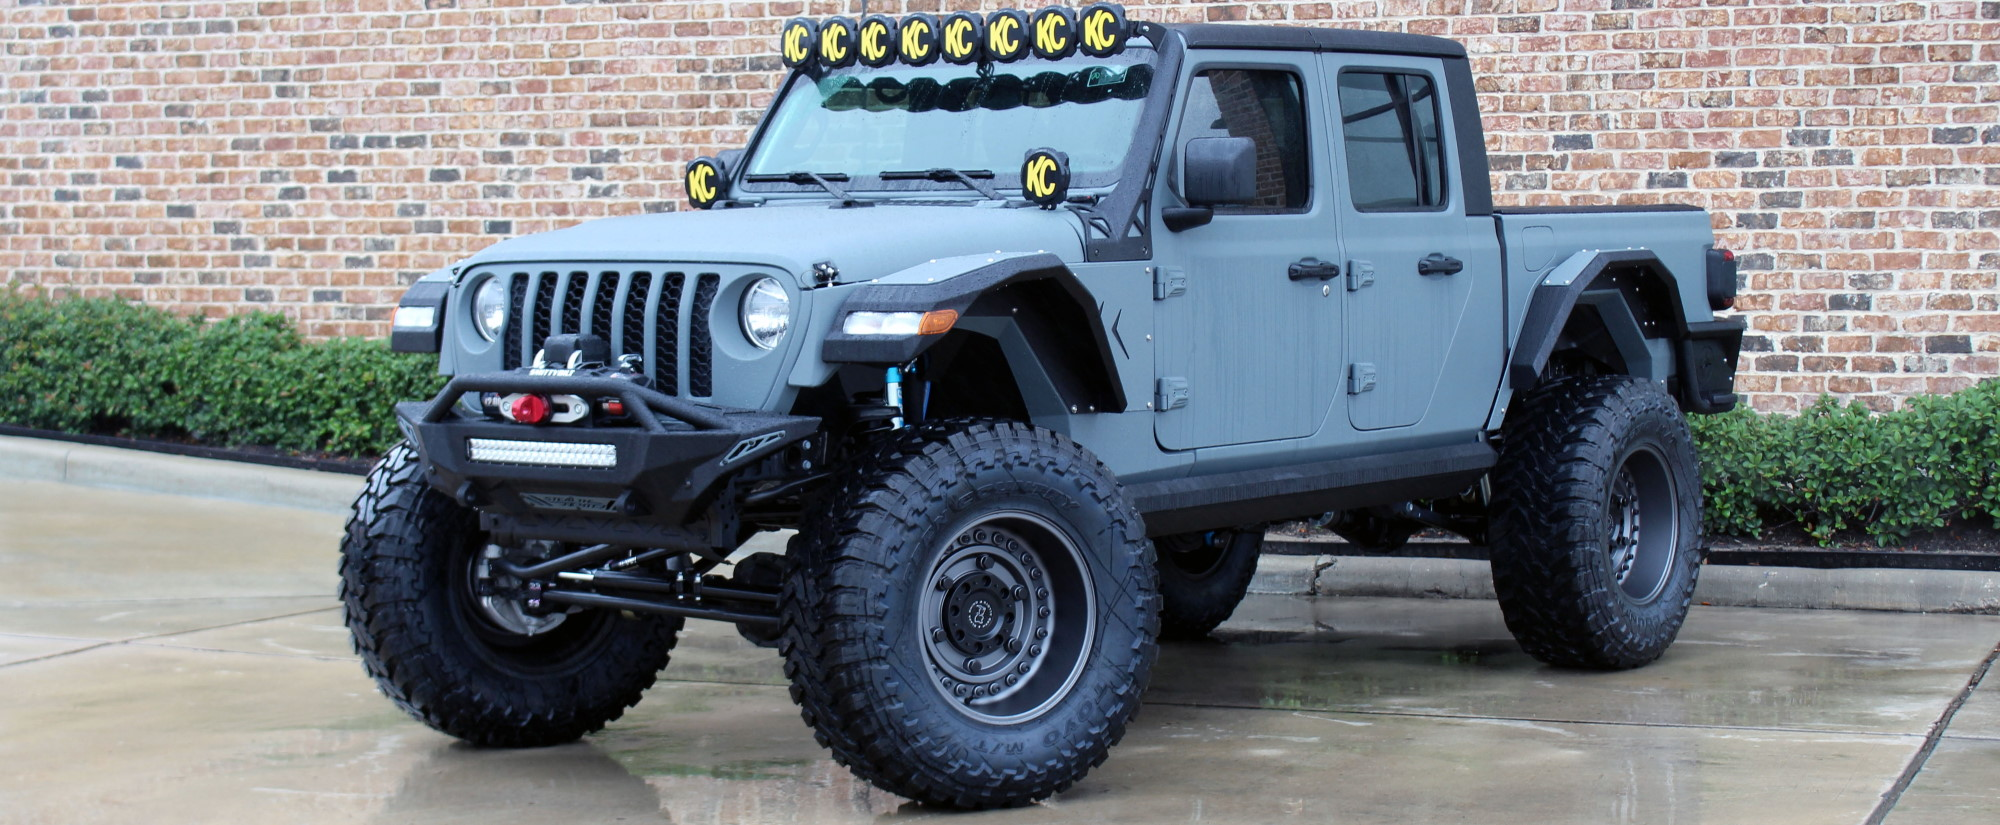 2020 jeep gladiator jt gray kevlar